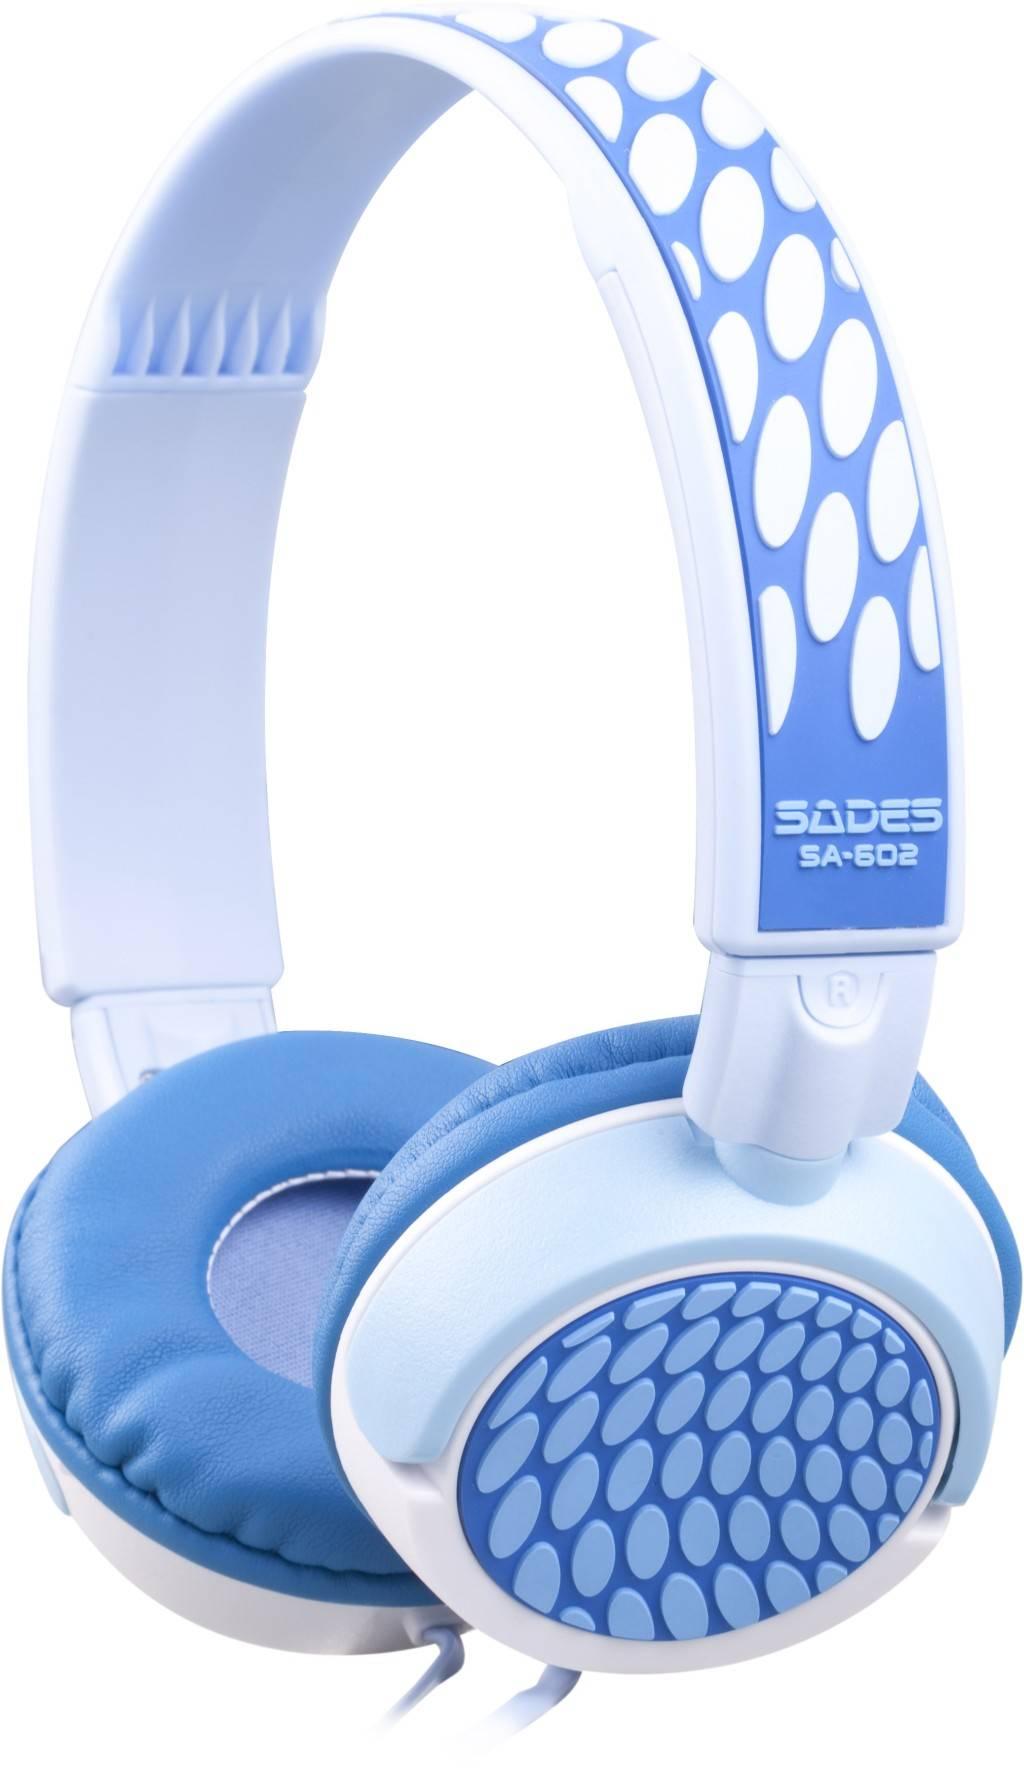 CE/RoHS Headphones with Unique Silicon Design (SA-602)